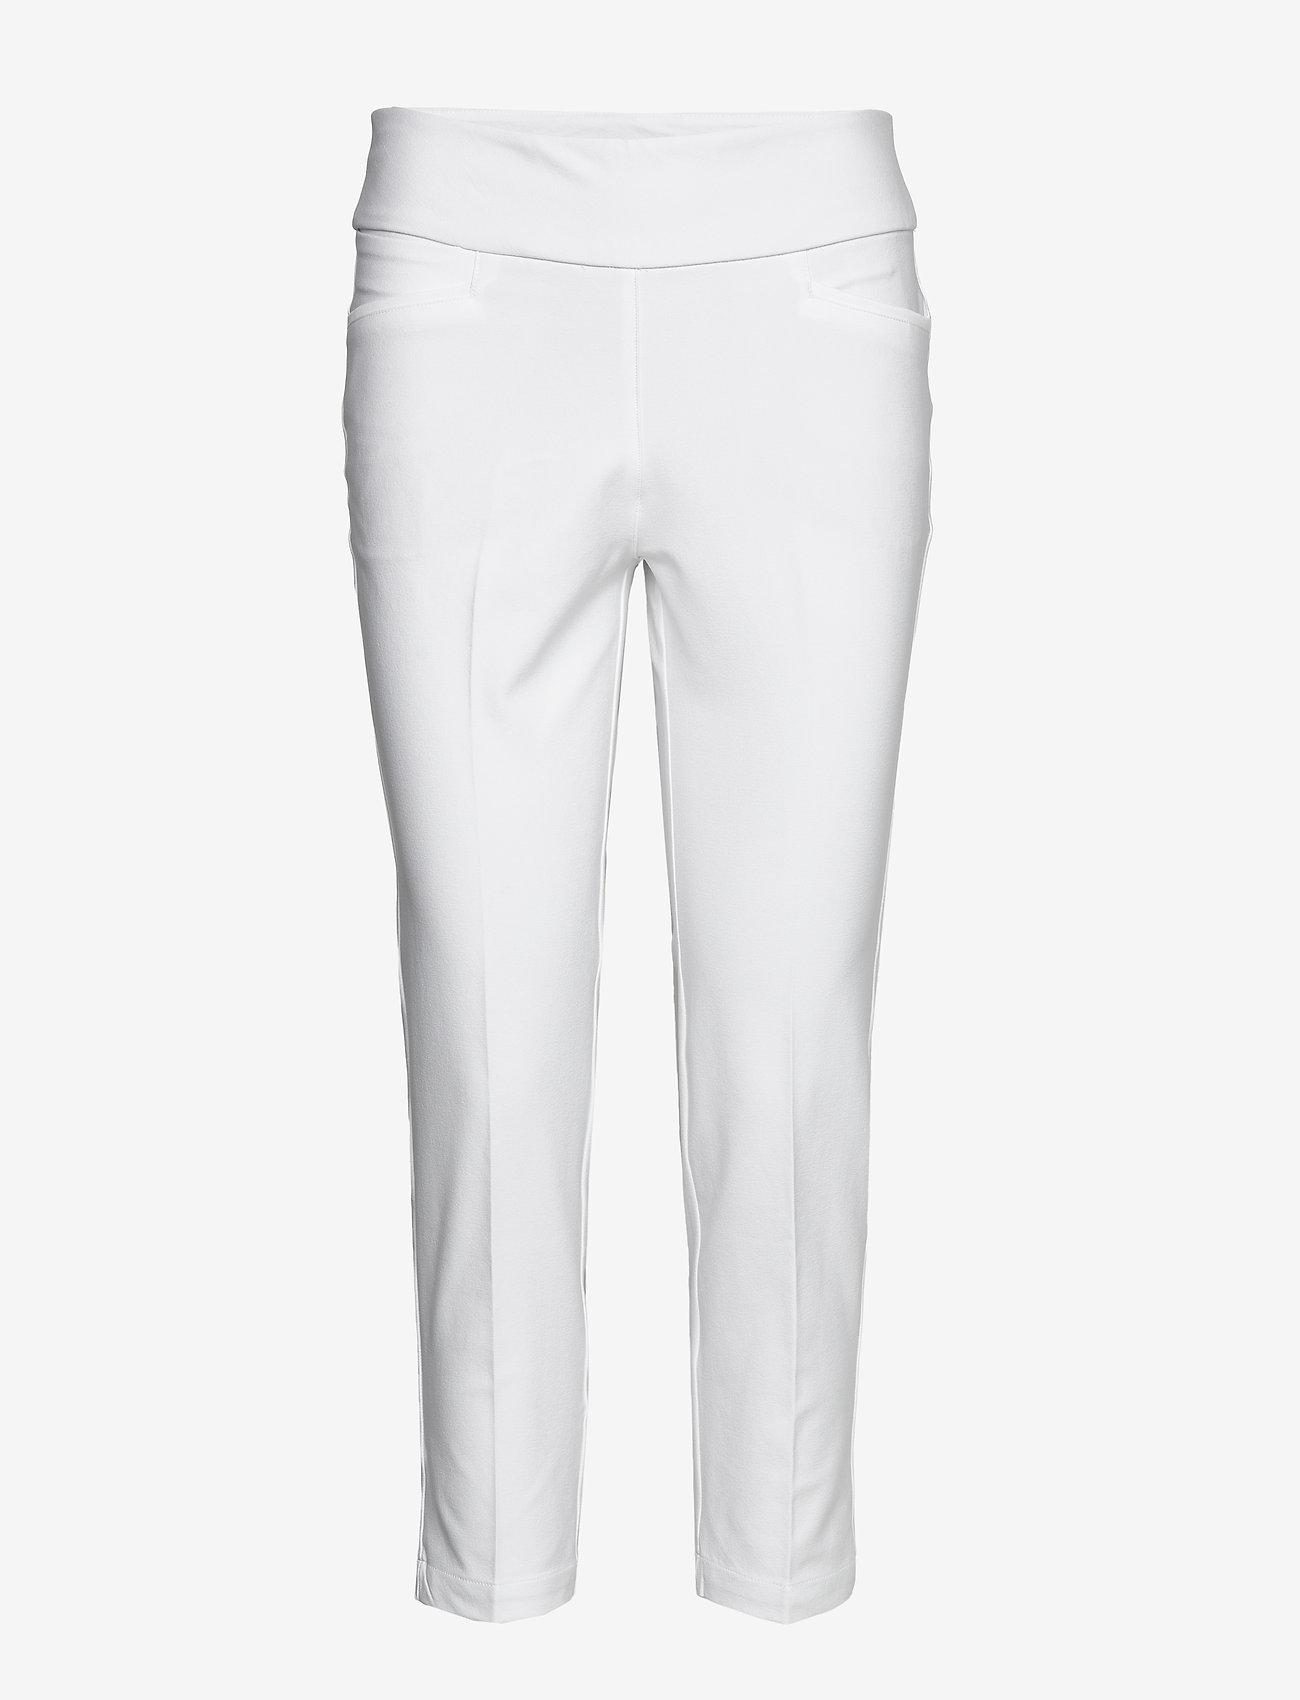 adidas Golf - PULLON ANKL PT - golf pants - white - 0